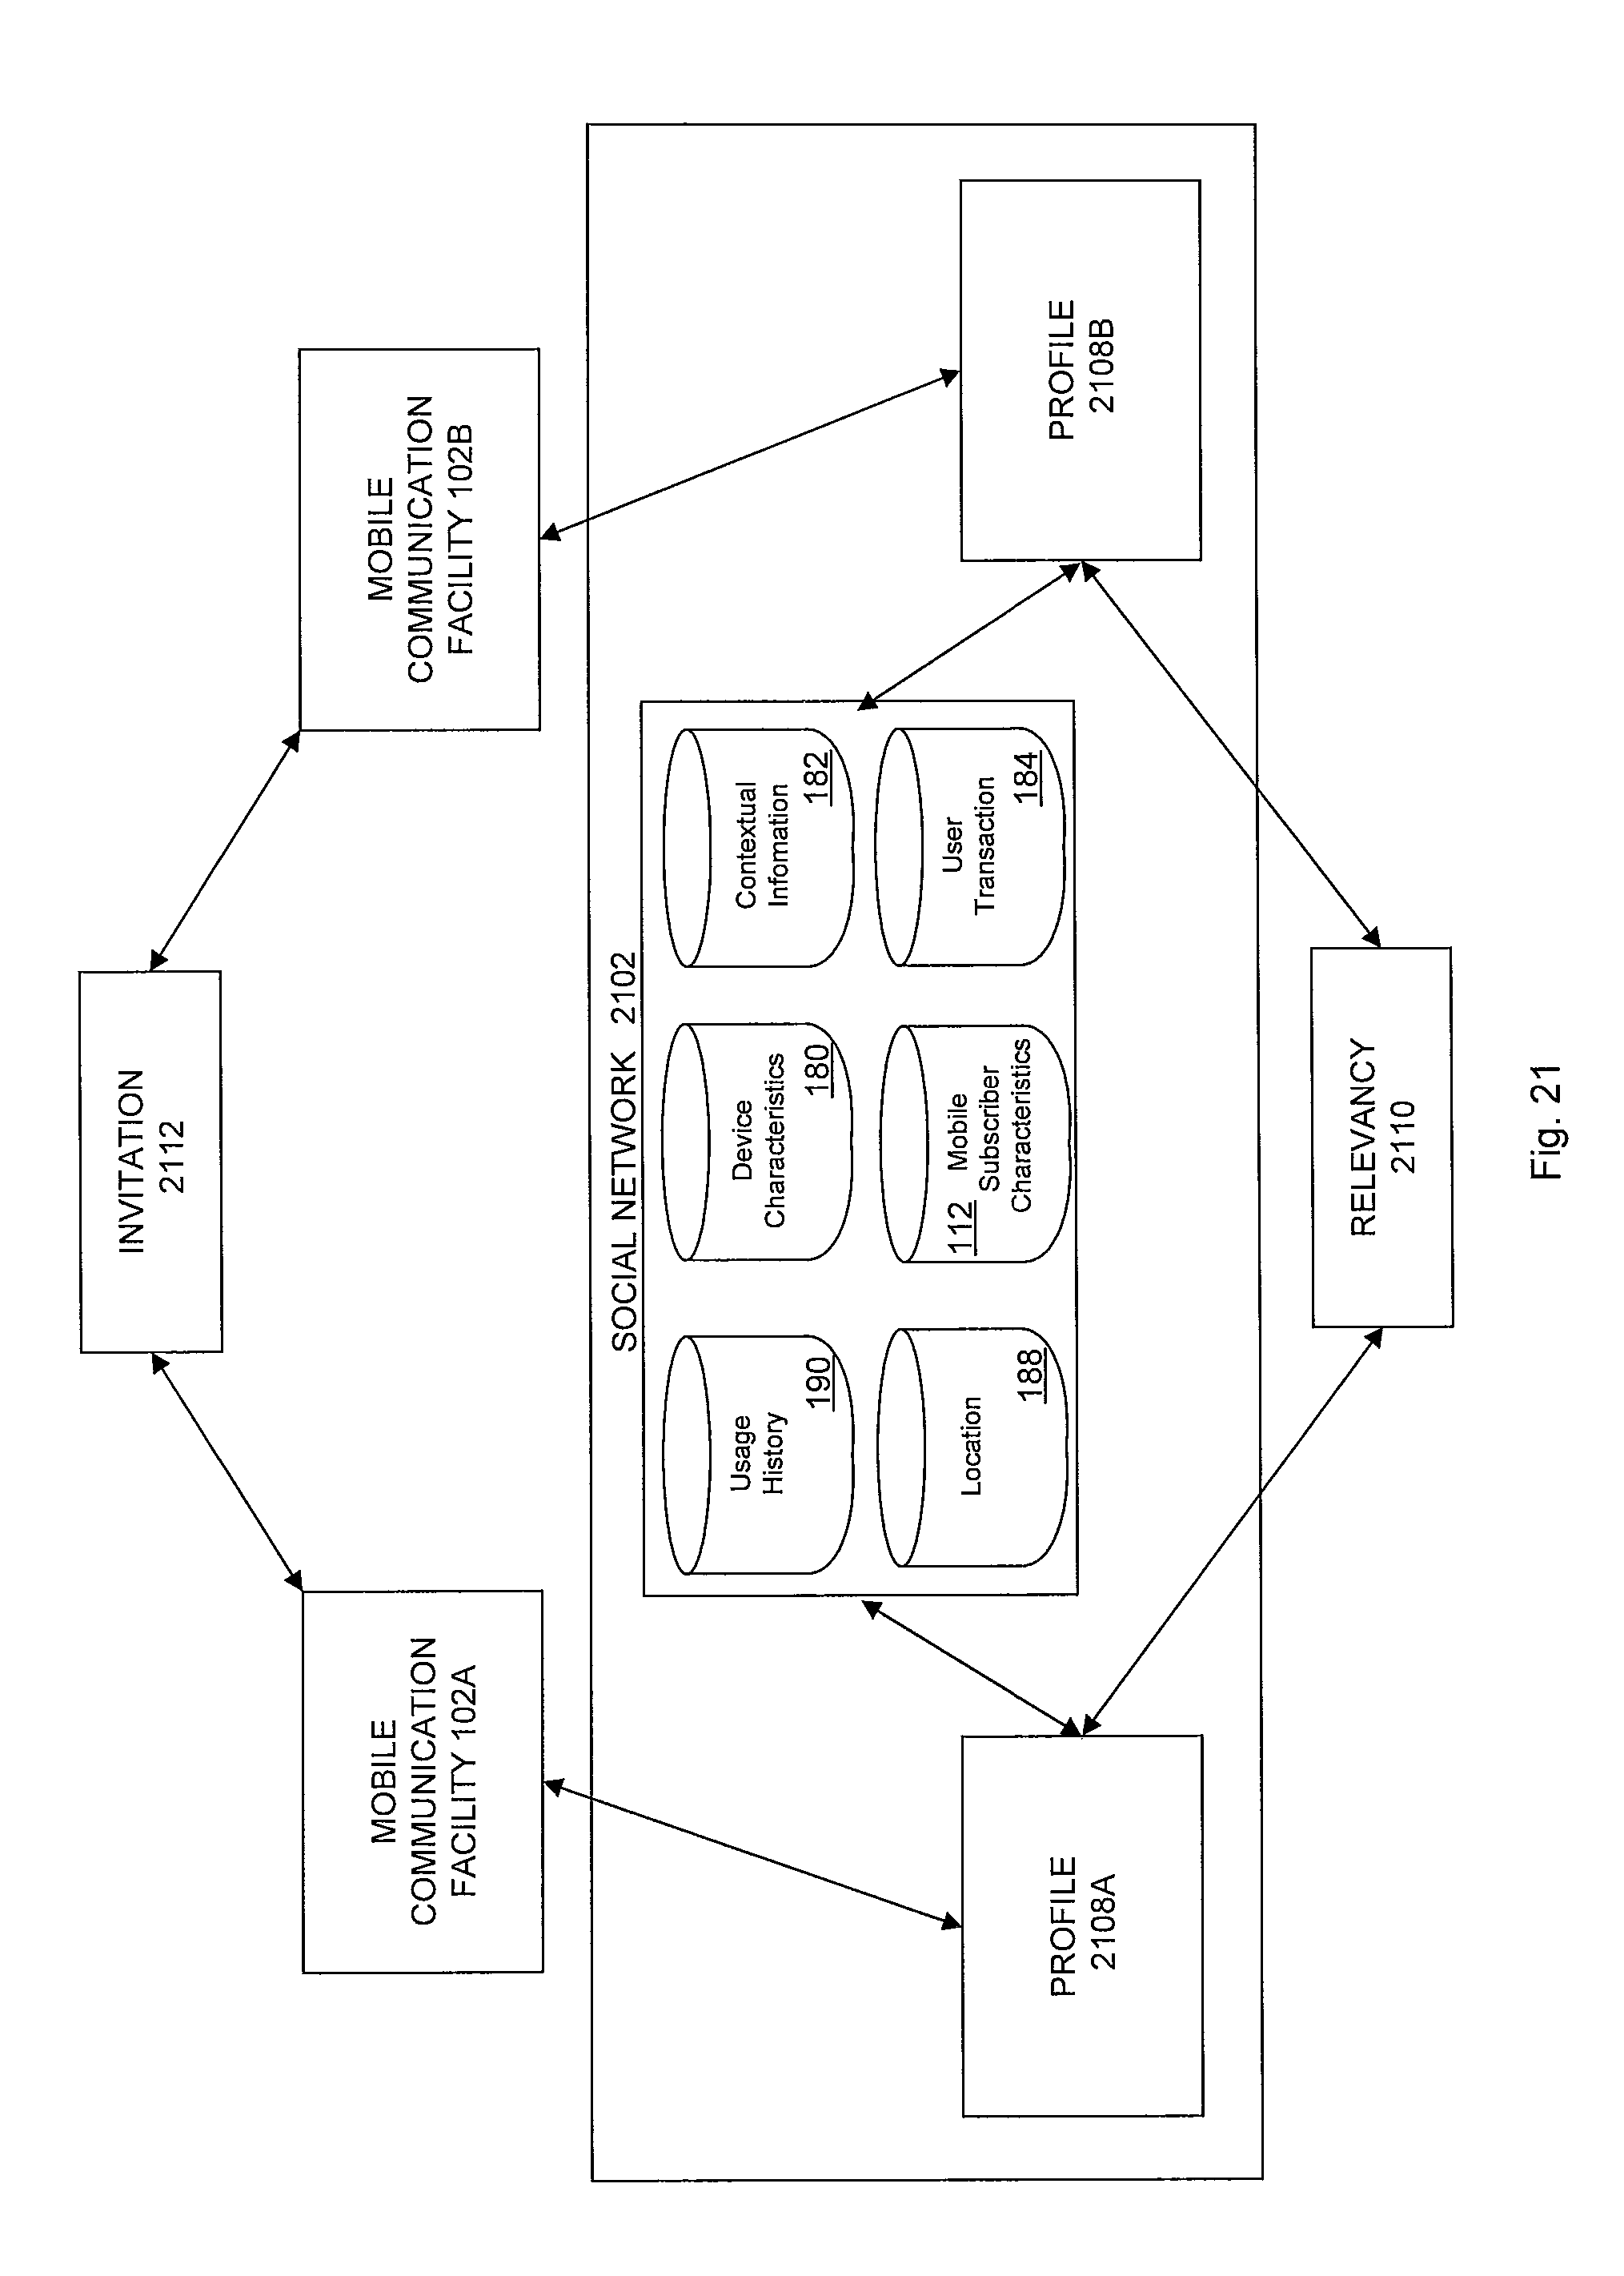 Patent US 8,209,344 B2